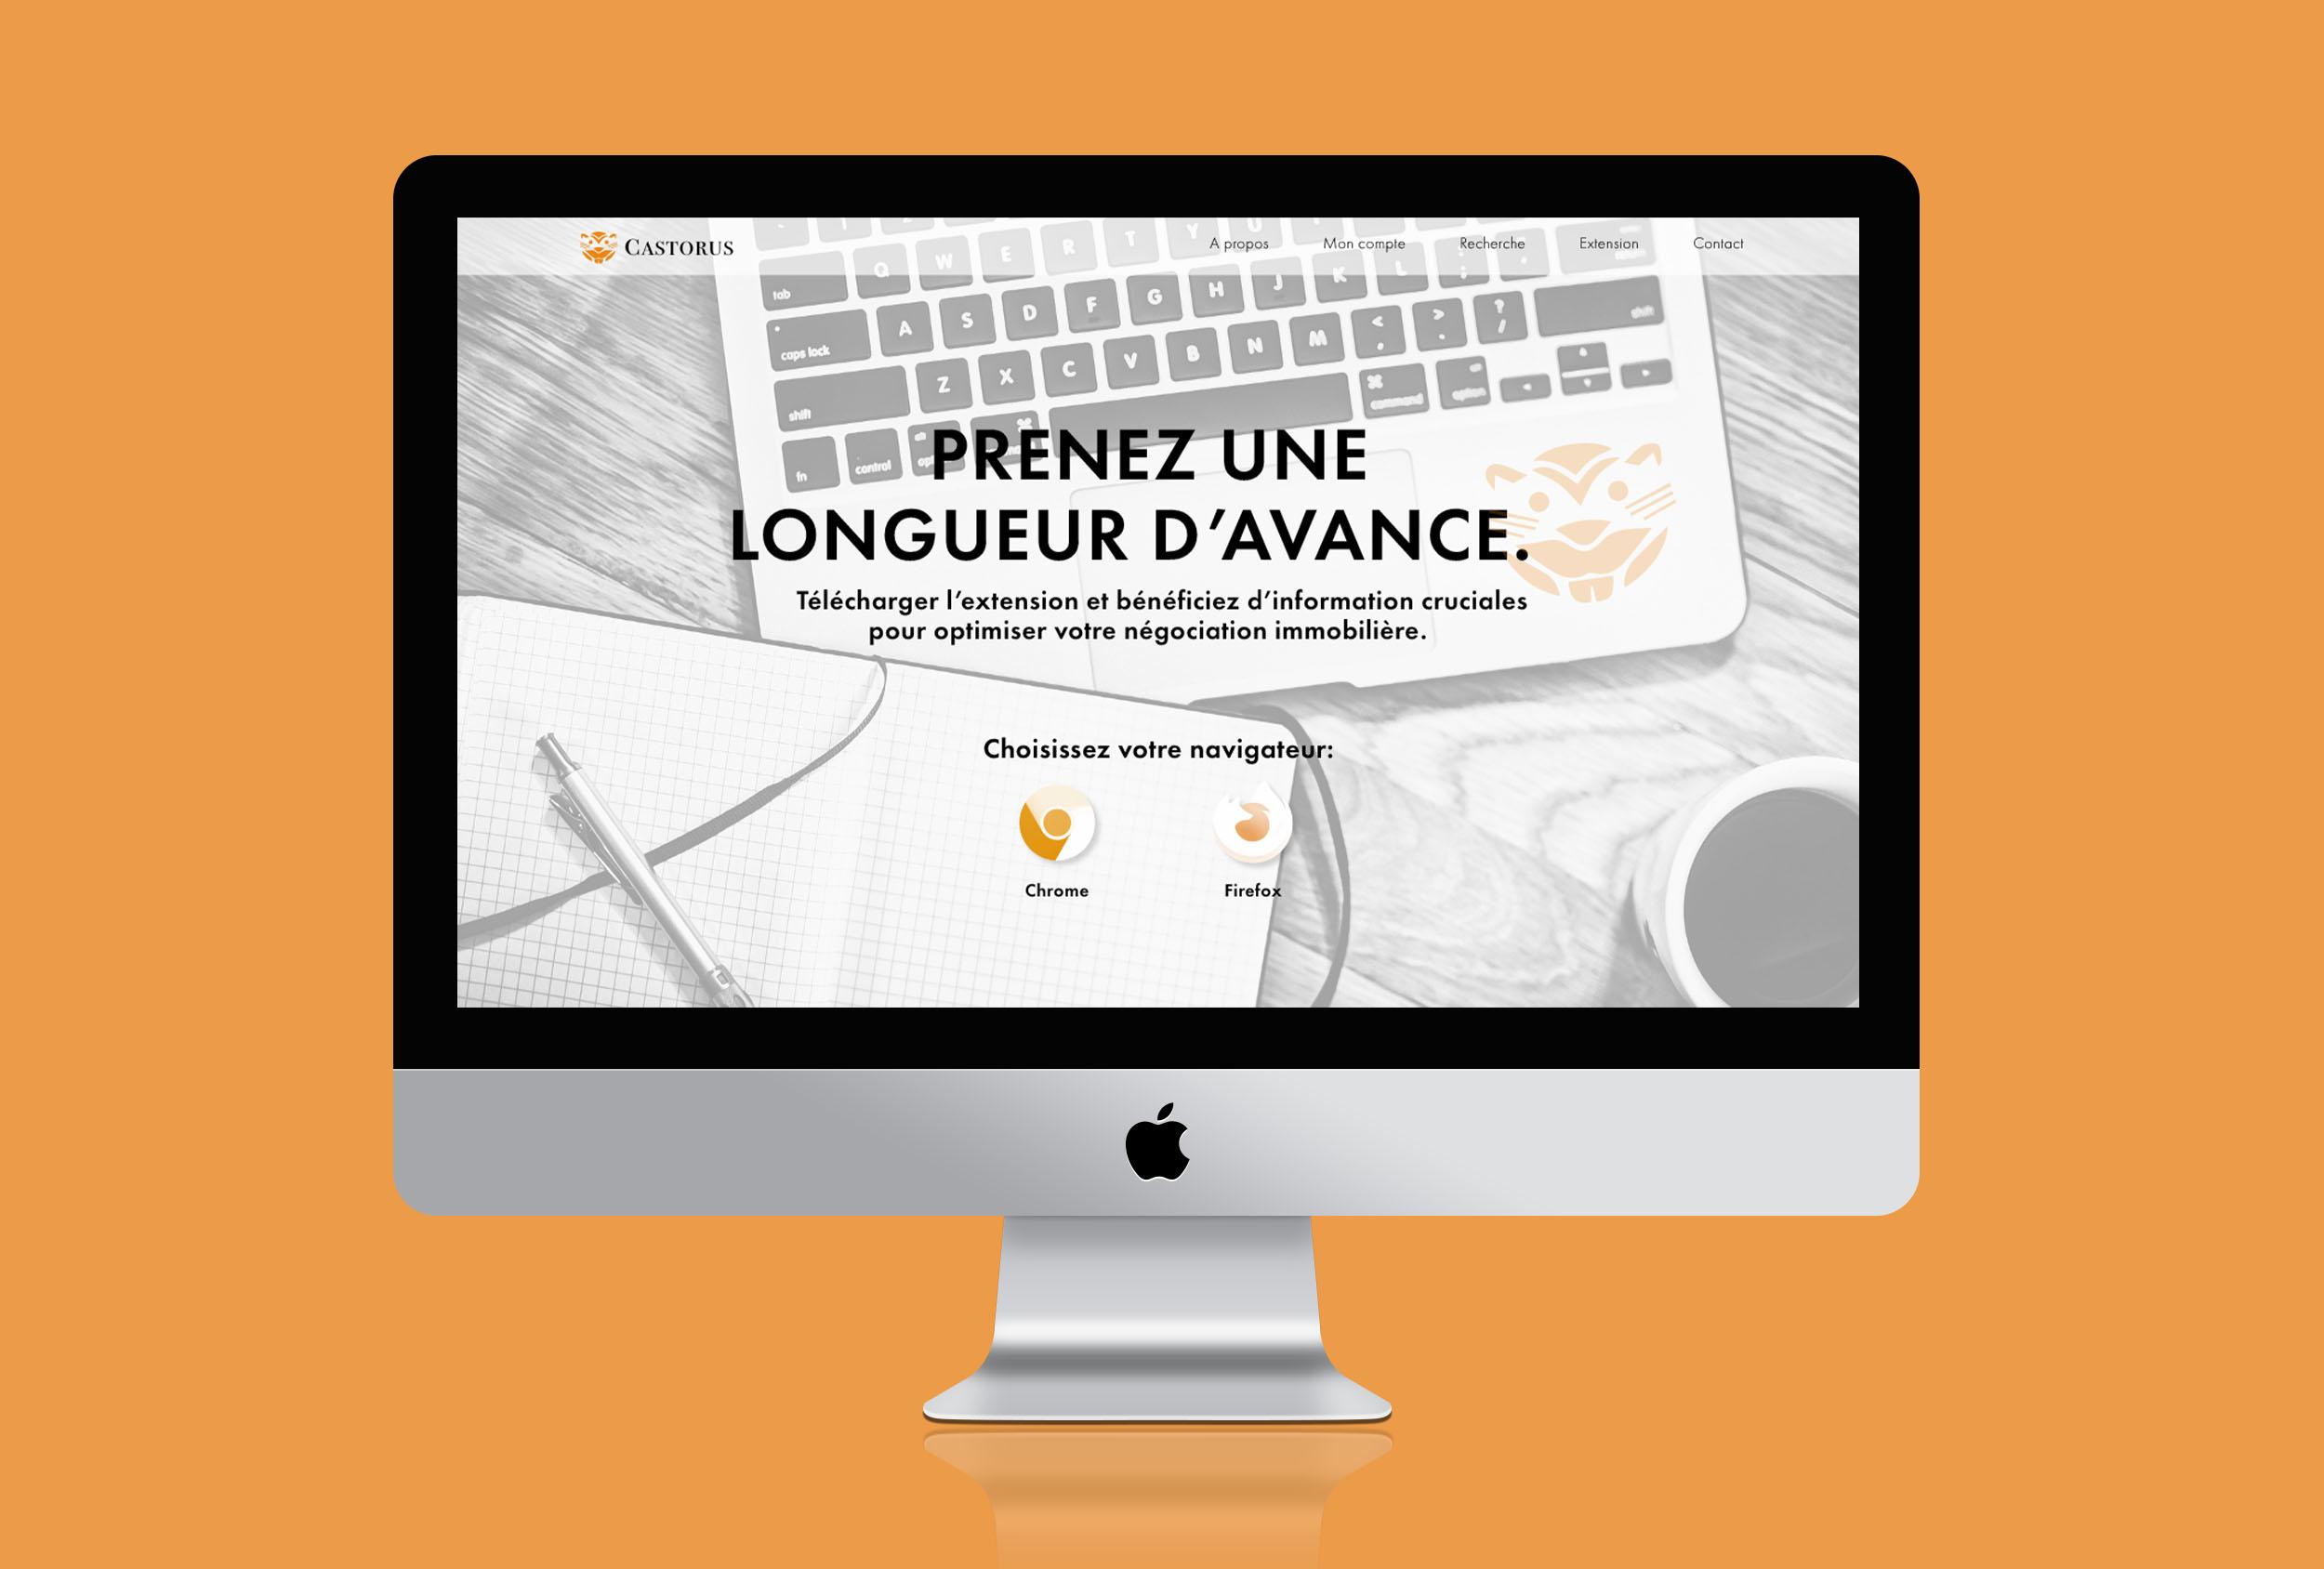 webdesign-julien-guichard-création-site-internet-biarritz-bayonne-anglet